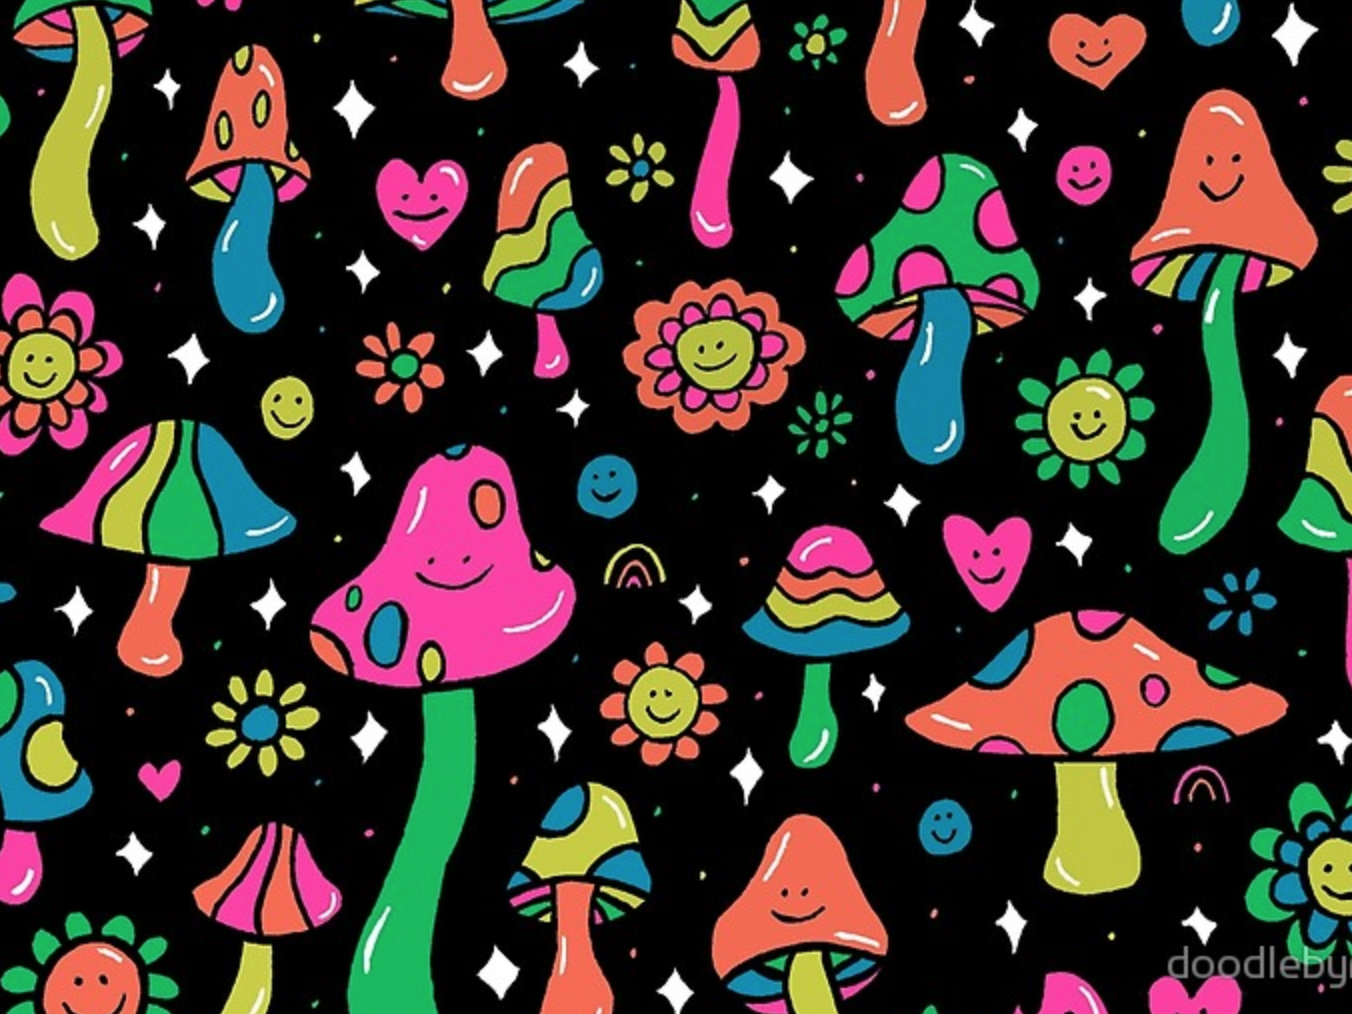 Rainbow Mushrooms print design pattern hippies hippie rainbows rainbow flowers mushrooms mushroom 60s 70s pink psychedelic orange retro vintage vector drawing illustration design